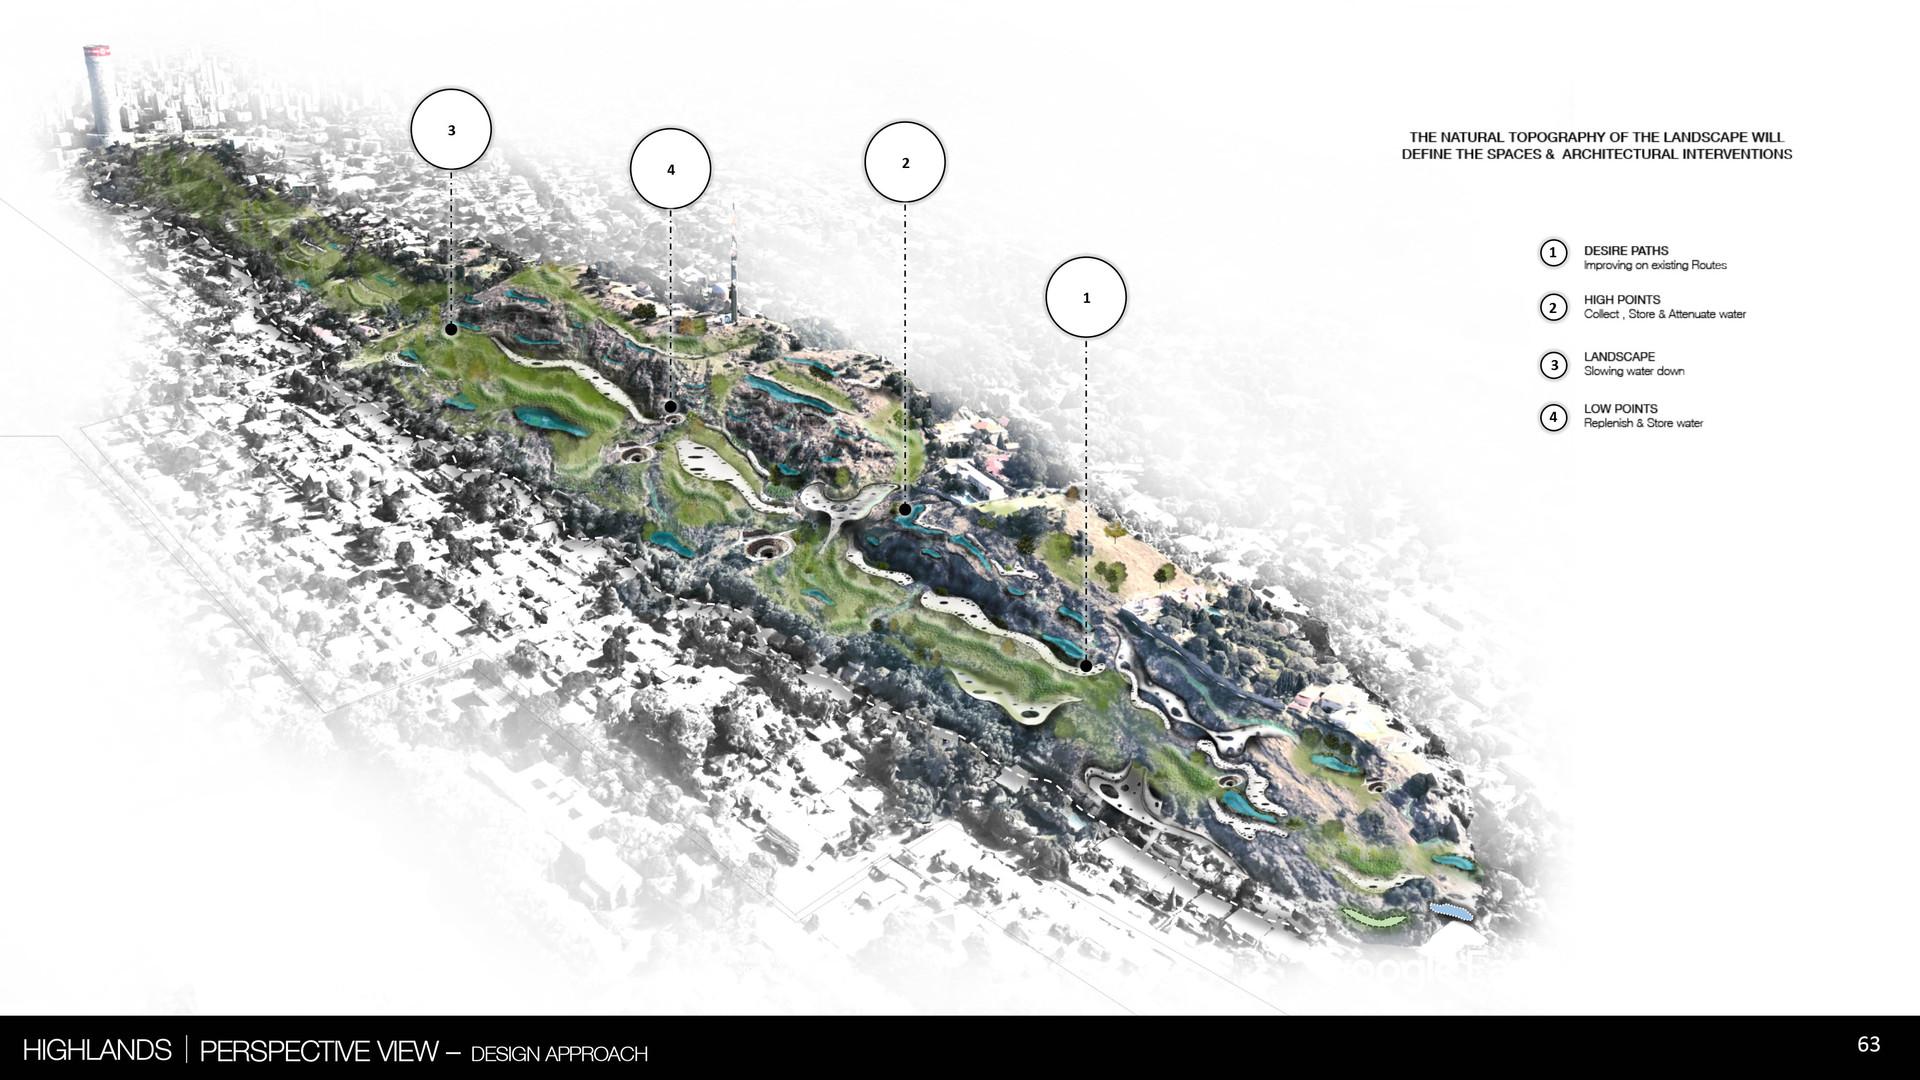 Design approach - The park fundamentals . Hassett, W. Unit 17. 2020.